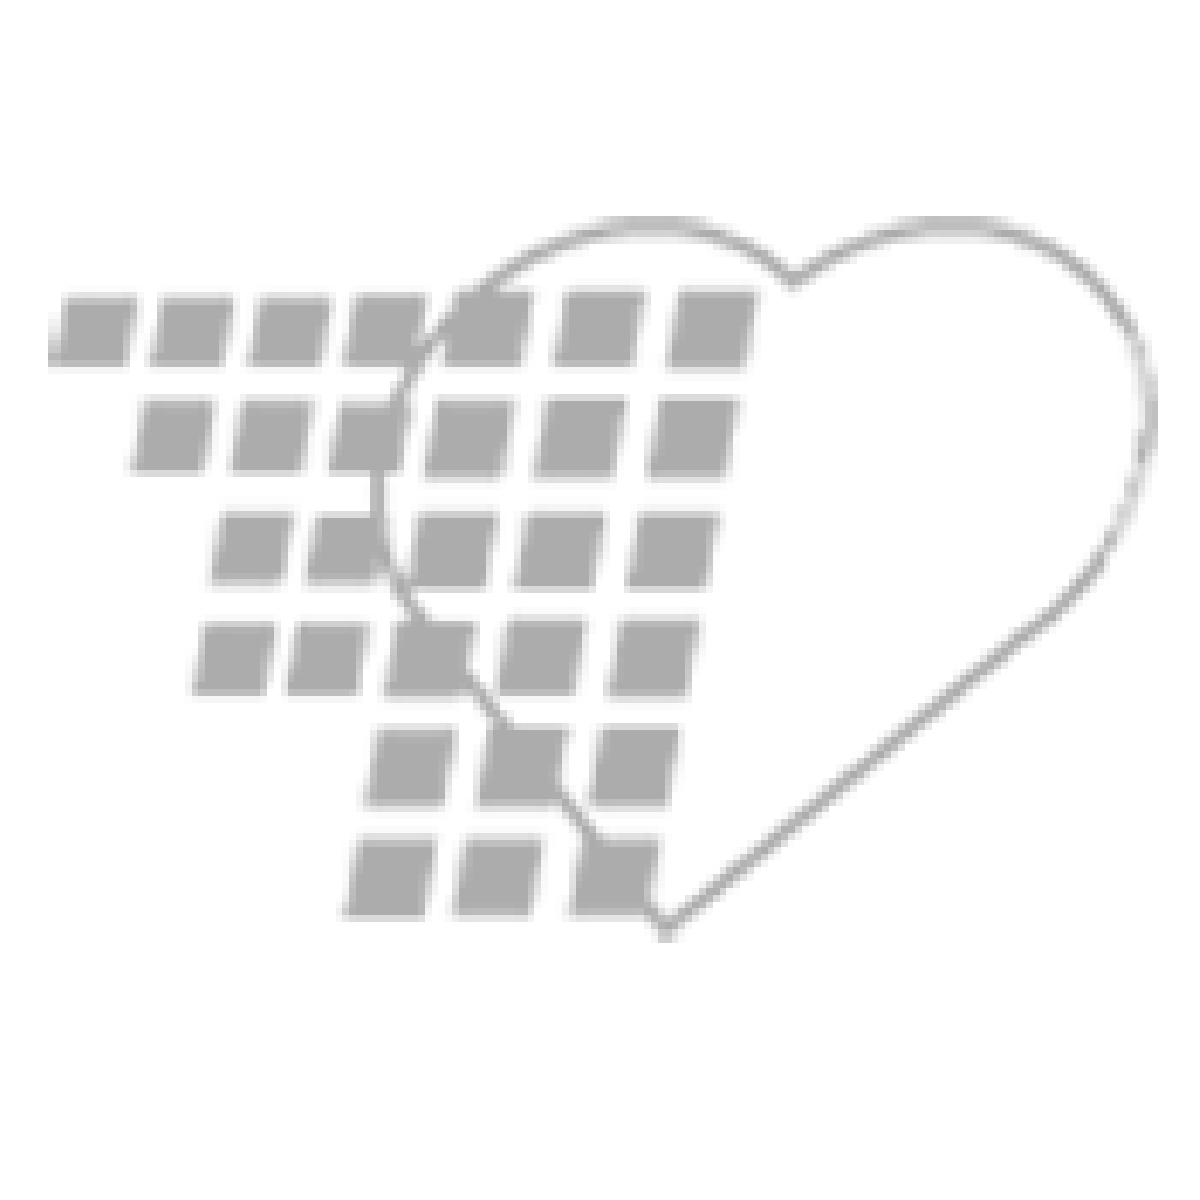 "06-82-0532 - Droplet Insulin Pen Needles - 31G X 5mm (3/16"")"